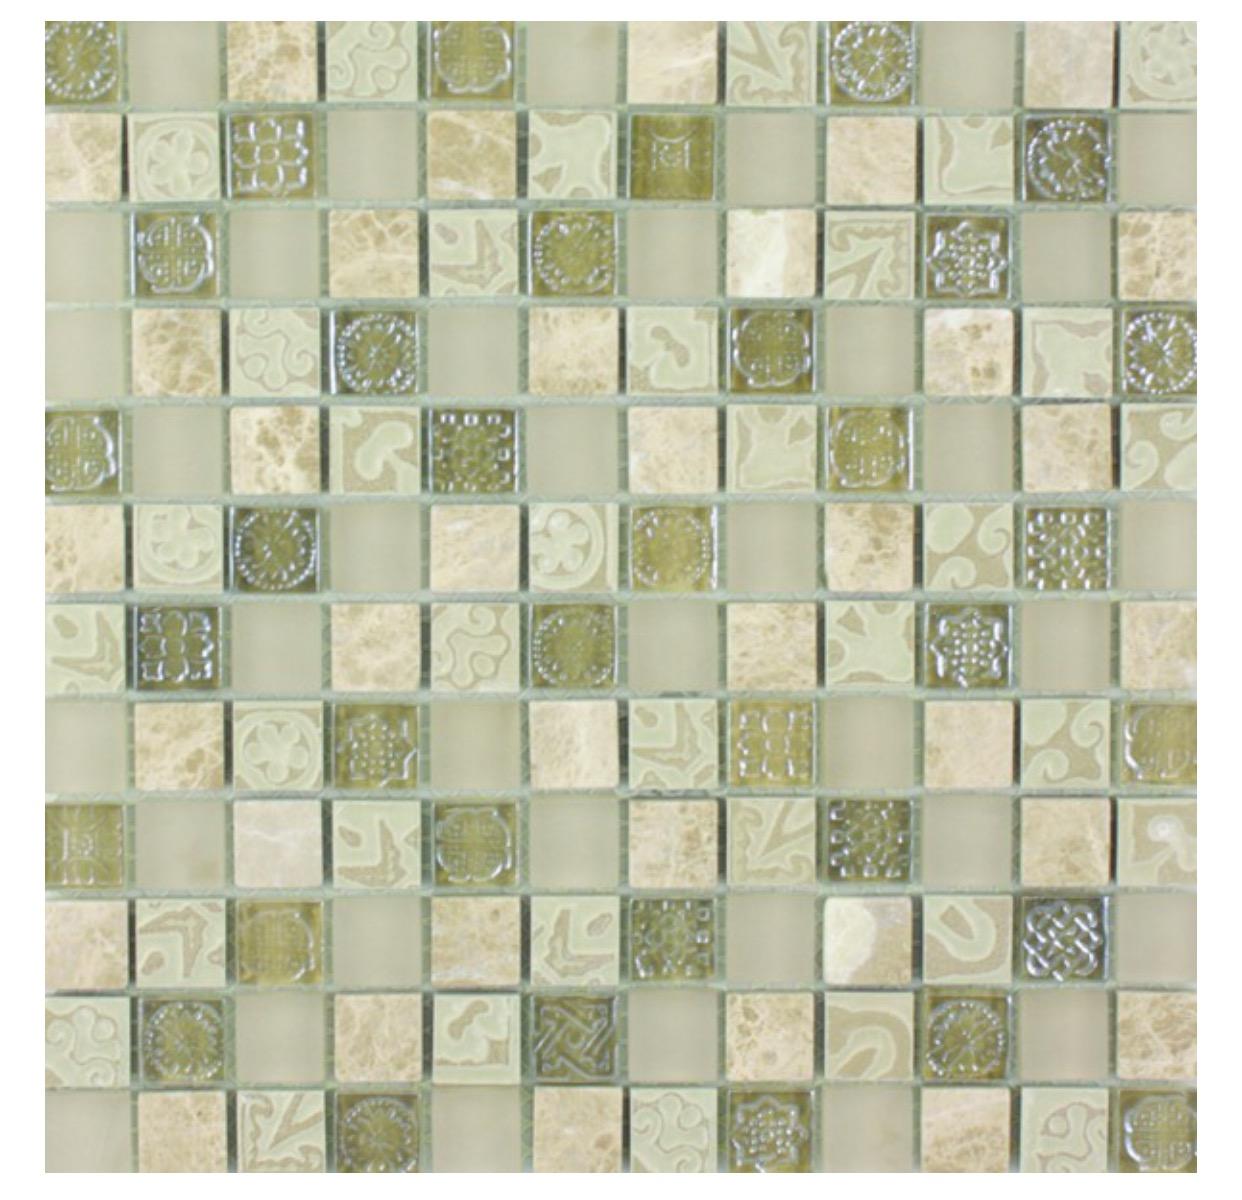 Waxman Ceramics Lux Sand Lux 020 306mm X 306mm The Cornwall Tile